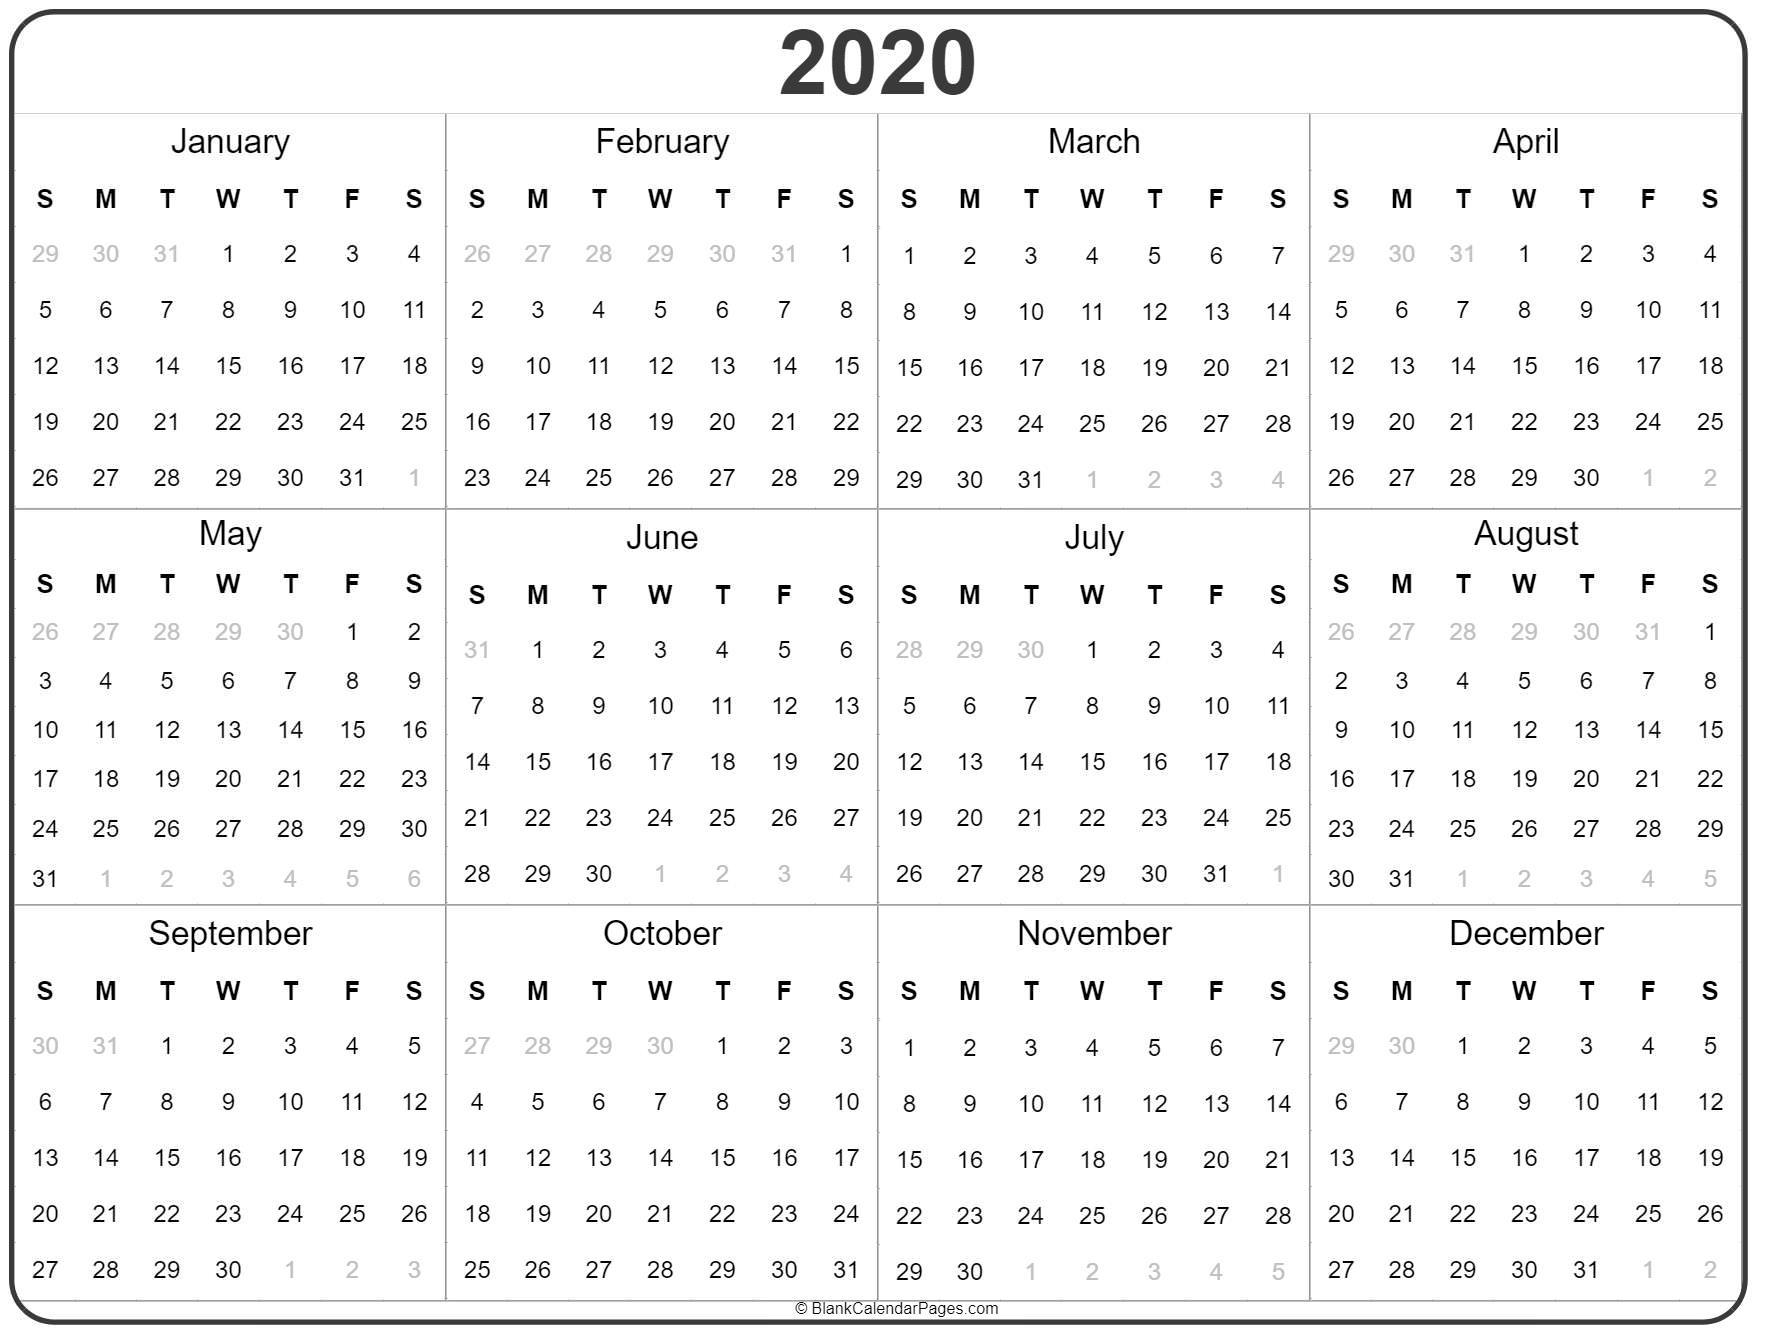 Blank Yearly Calendar 2020 - Colona.rsd7 2020 Yearly Calendar Printable